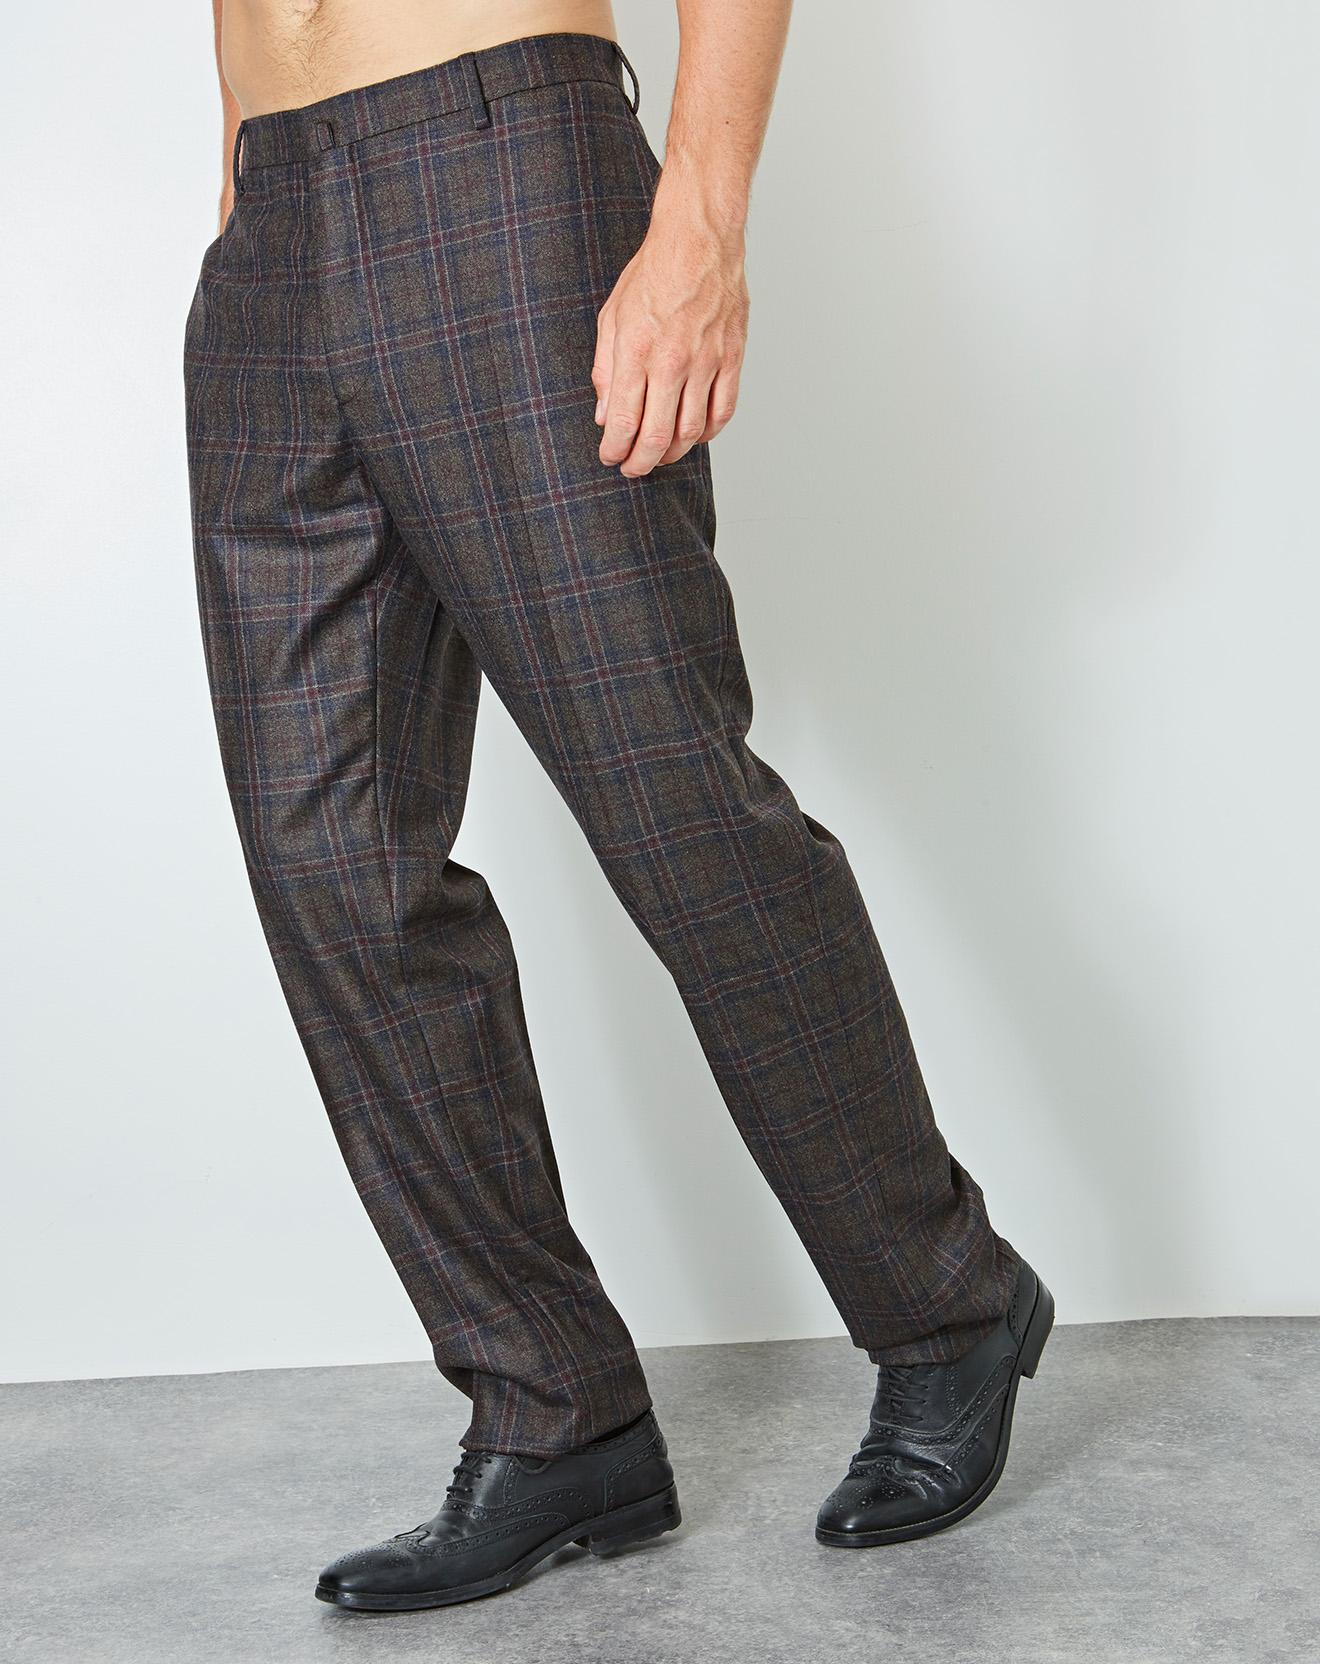 Pantalon 100% Laine bleu marine/marron - Hackett London - Modalova